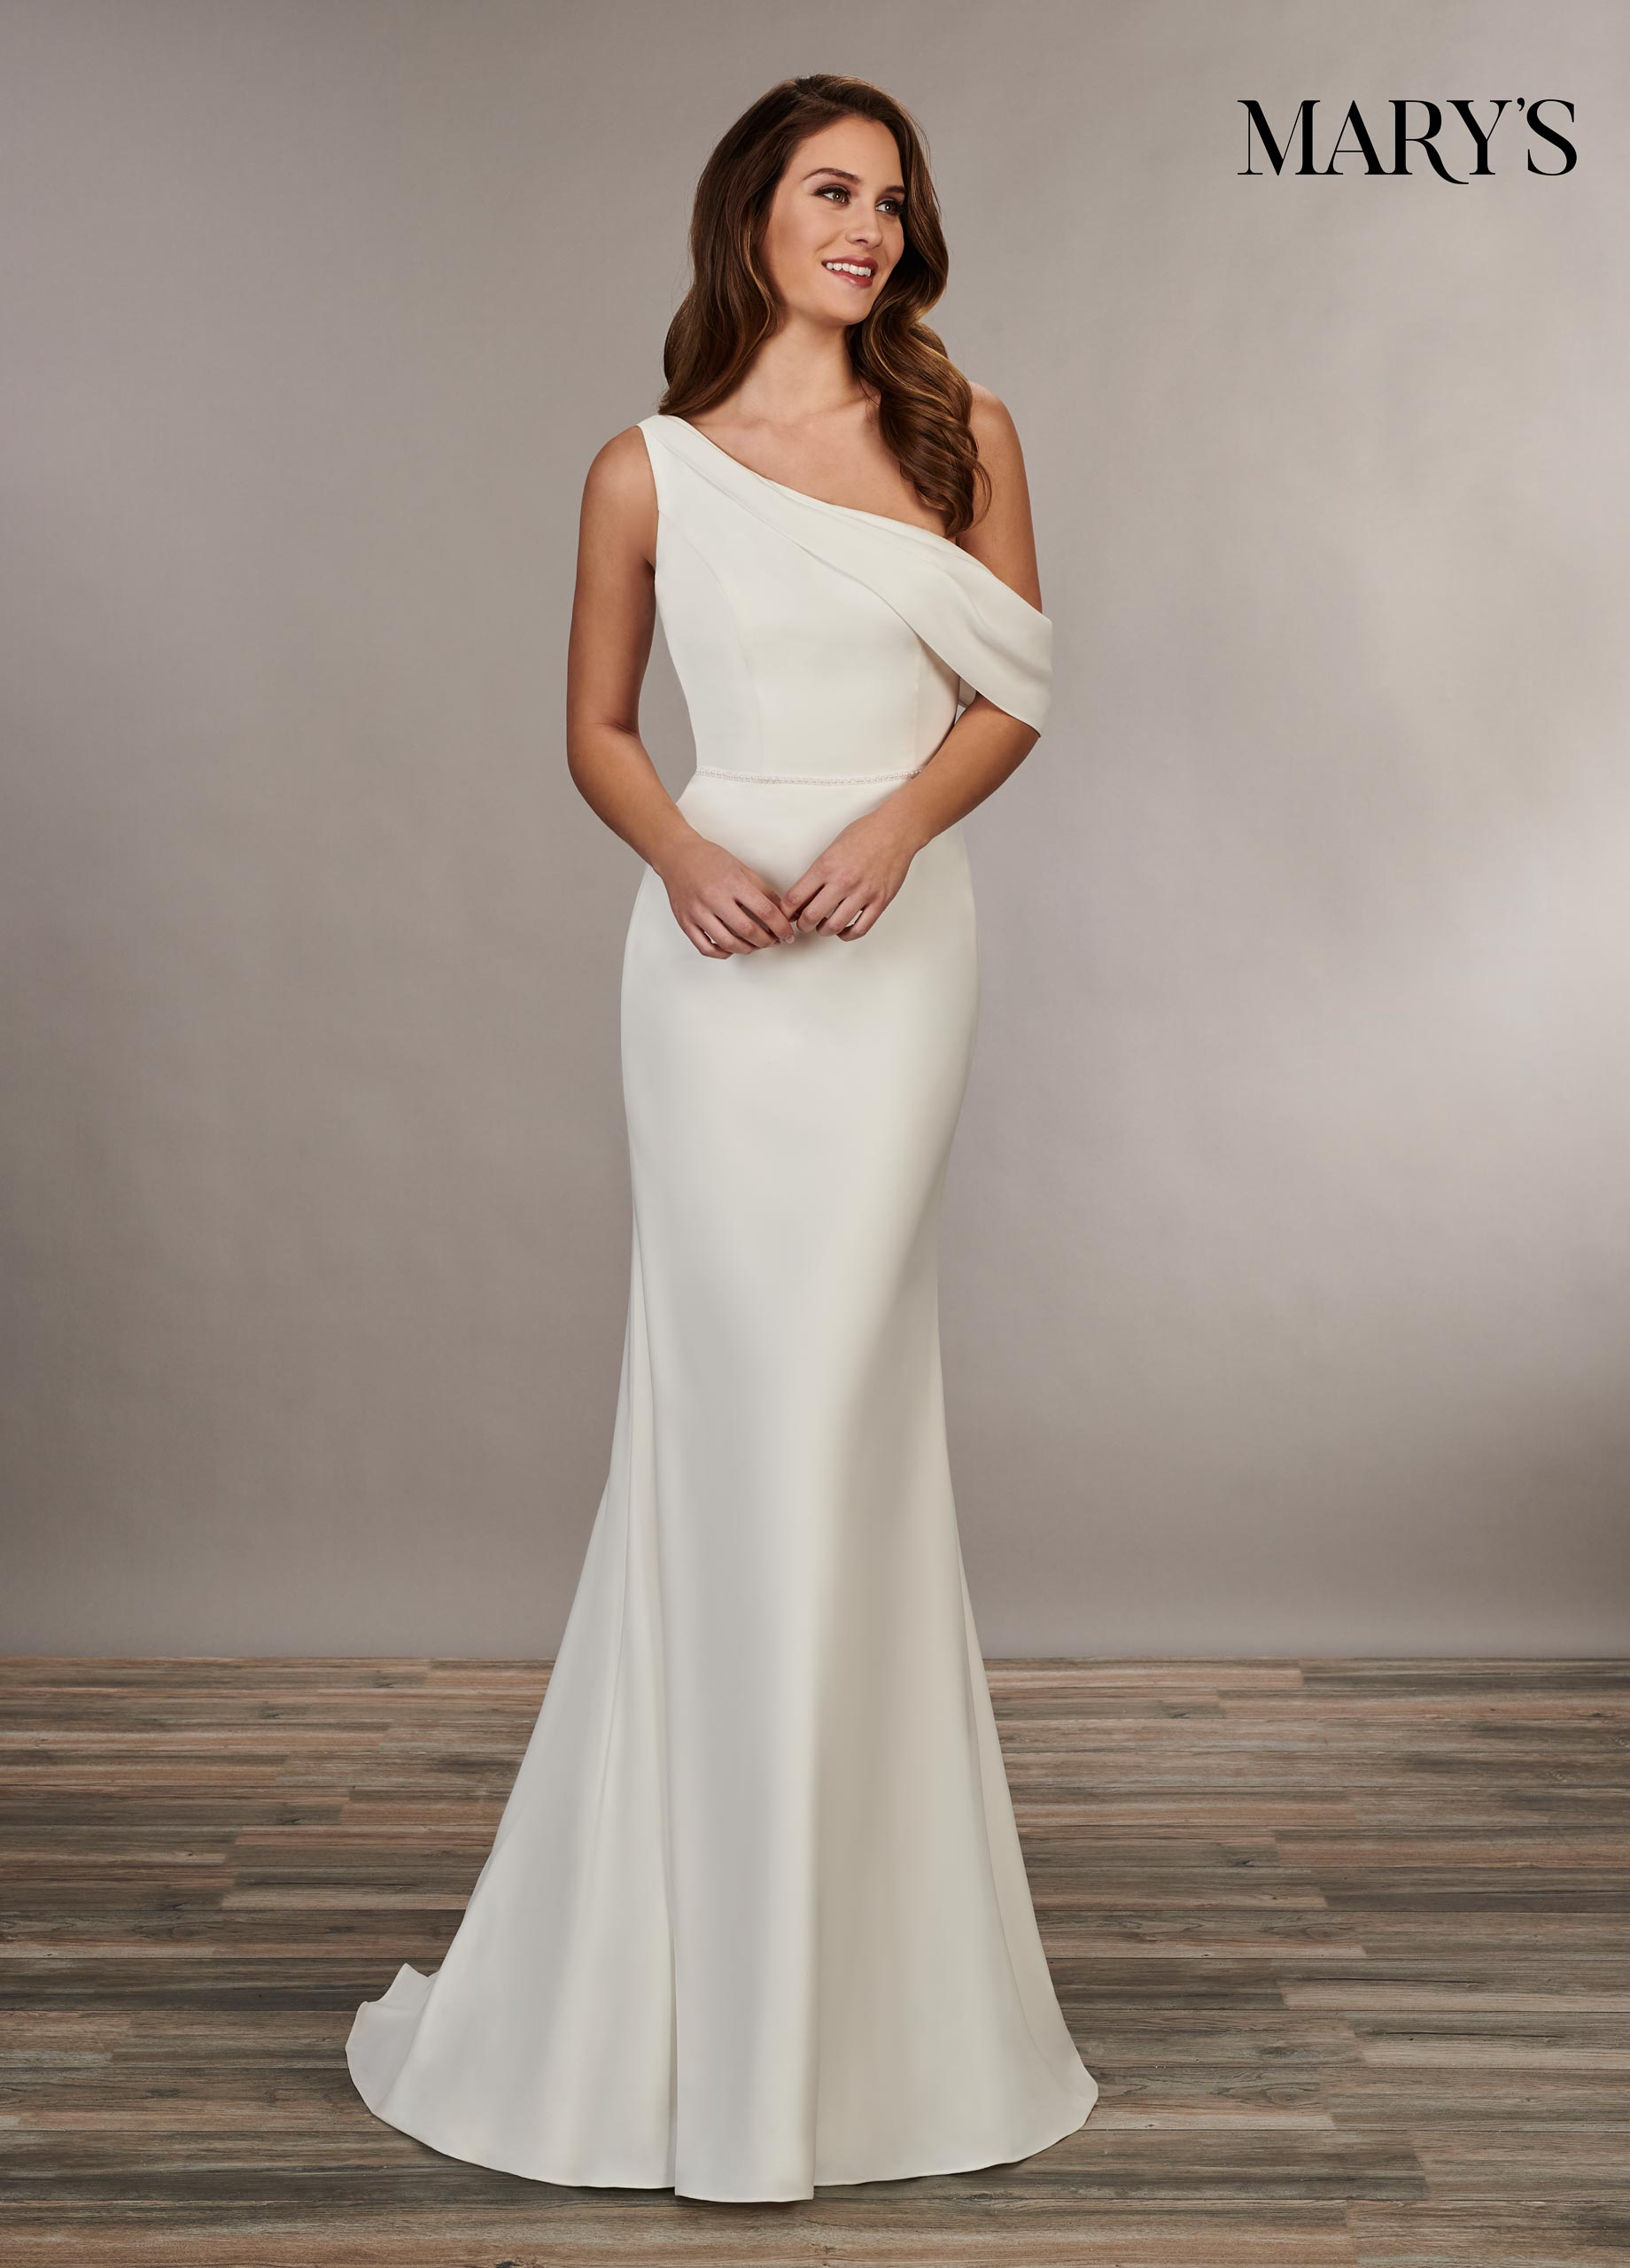 Bridal Wedding Dresses | Mary's | Style - MB1042